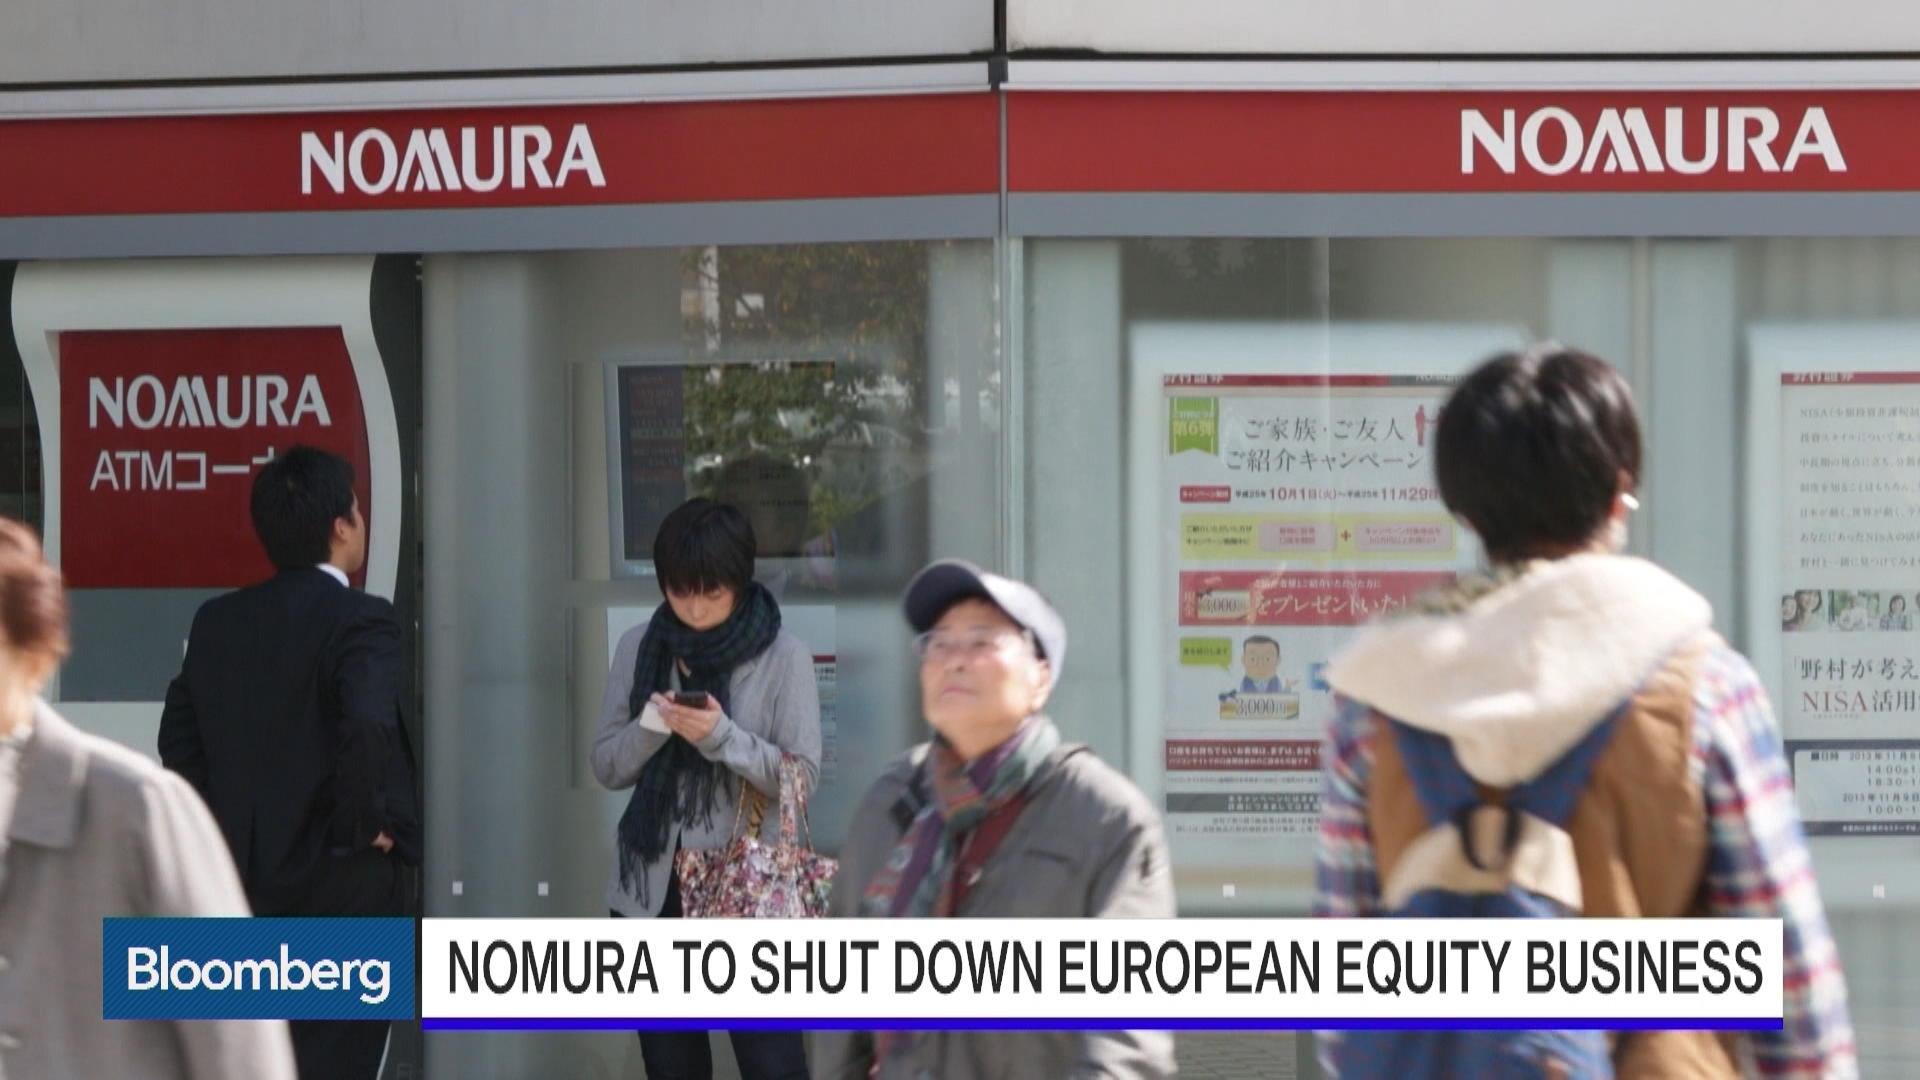 Nomura to shut down european equity business bloomberg madrichimfo Images